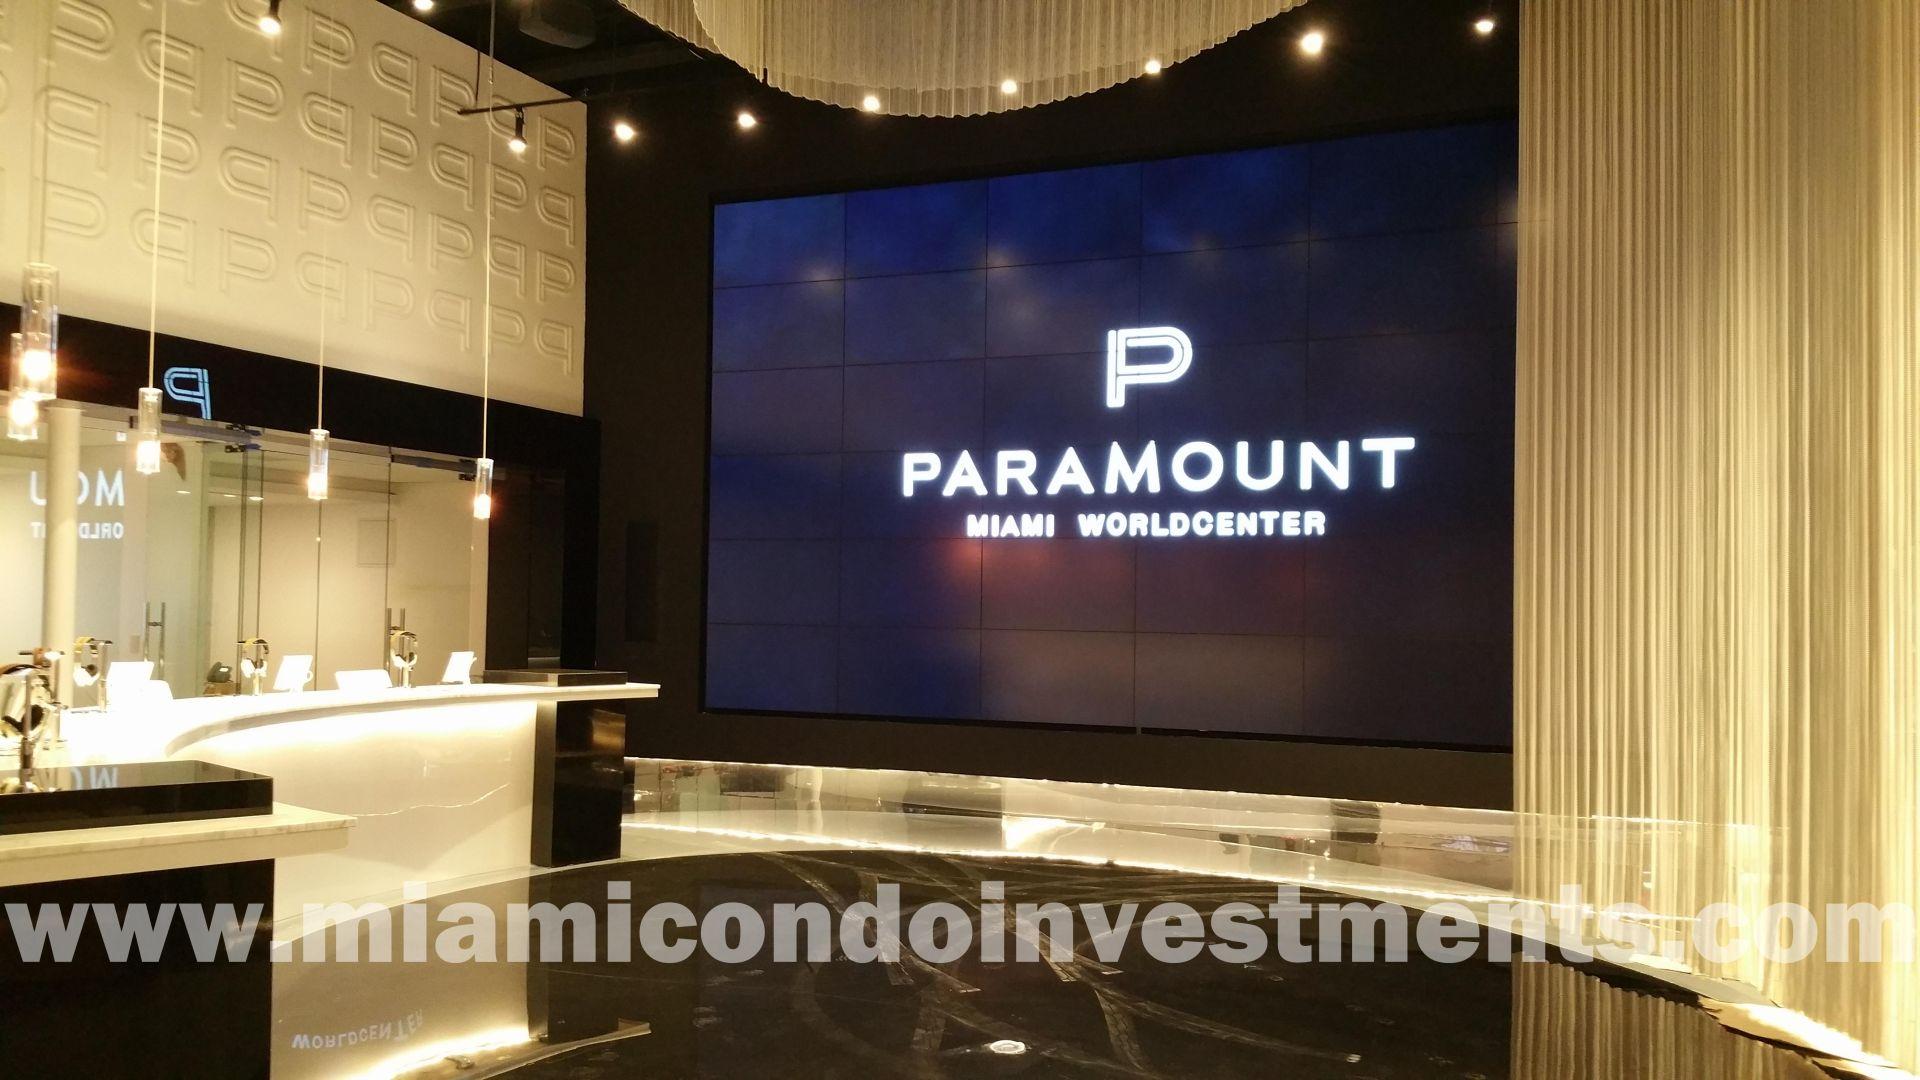 Paramount Miami Worldcenter sales center